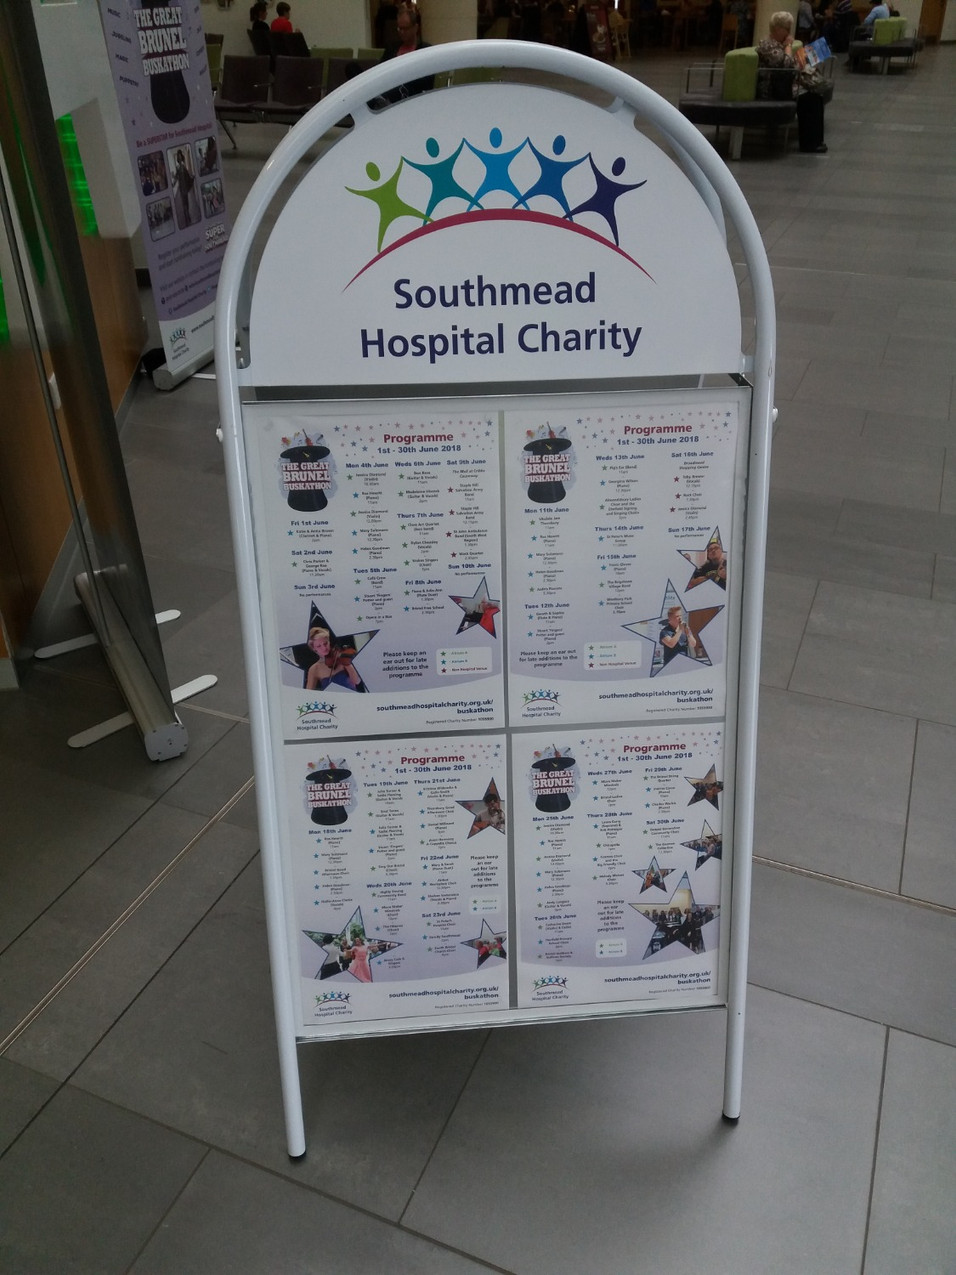 Southmead Hospital Buskathon